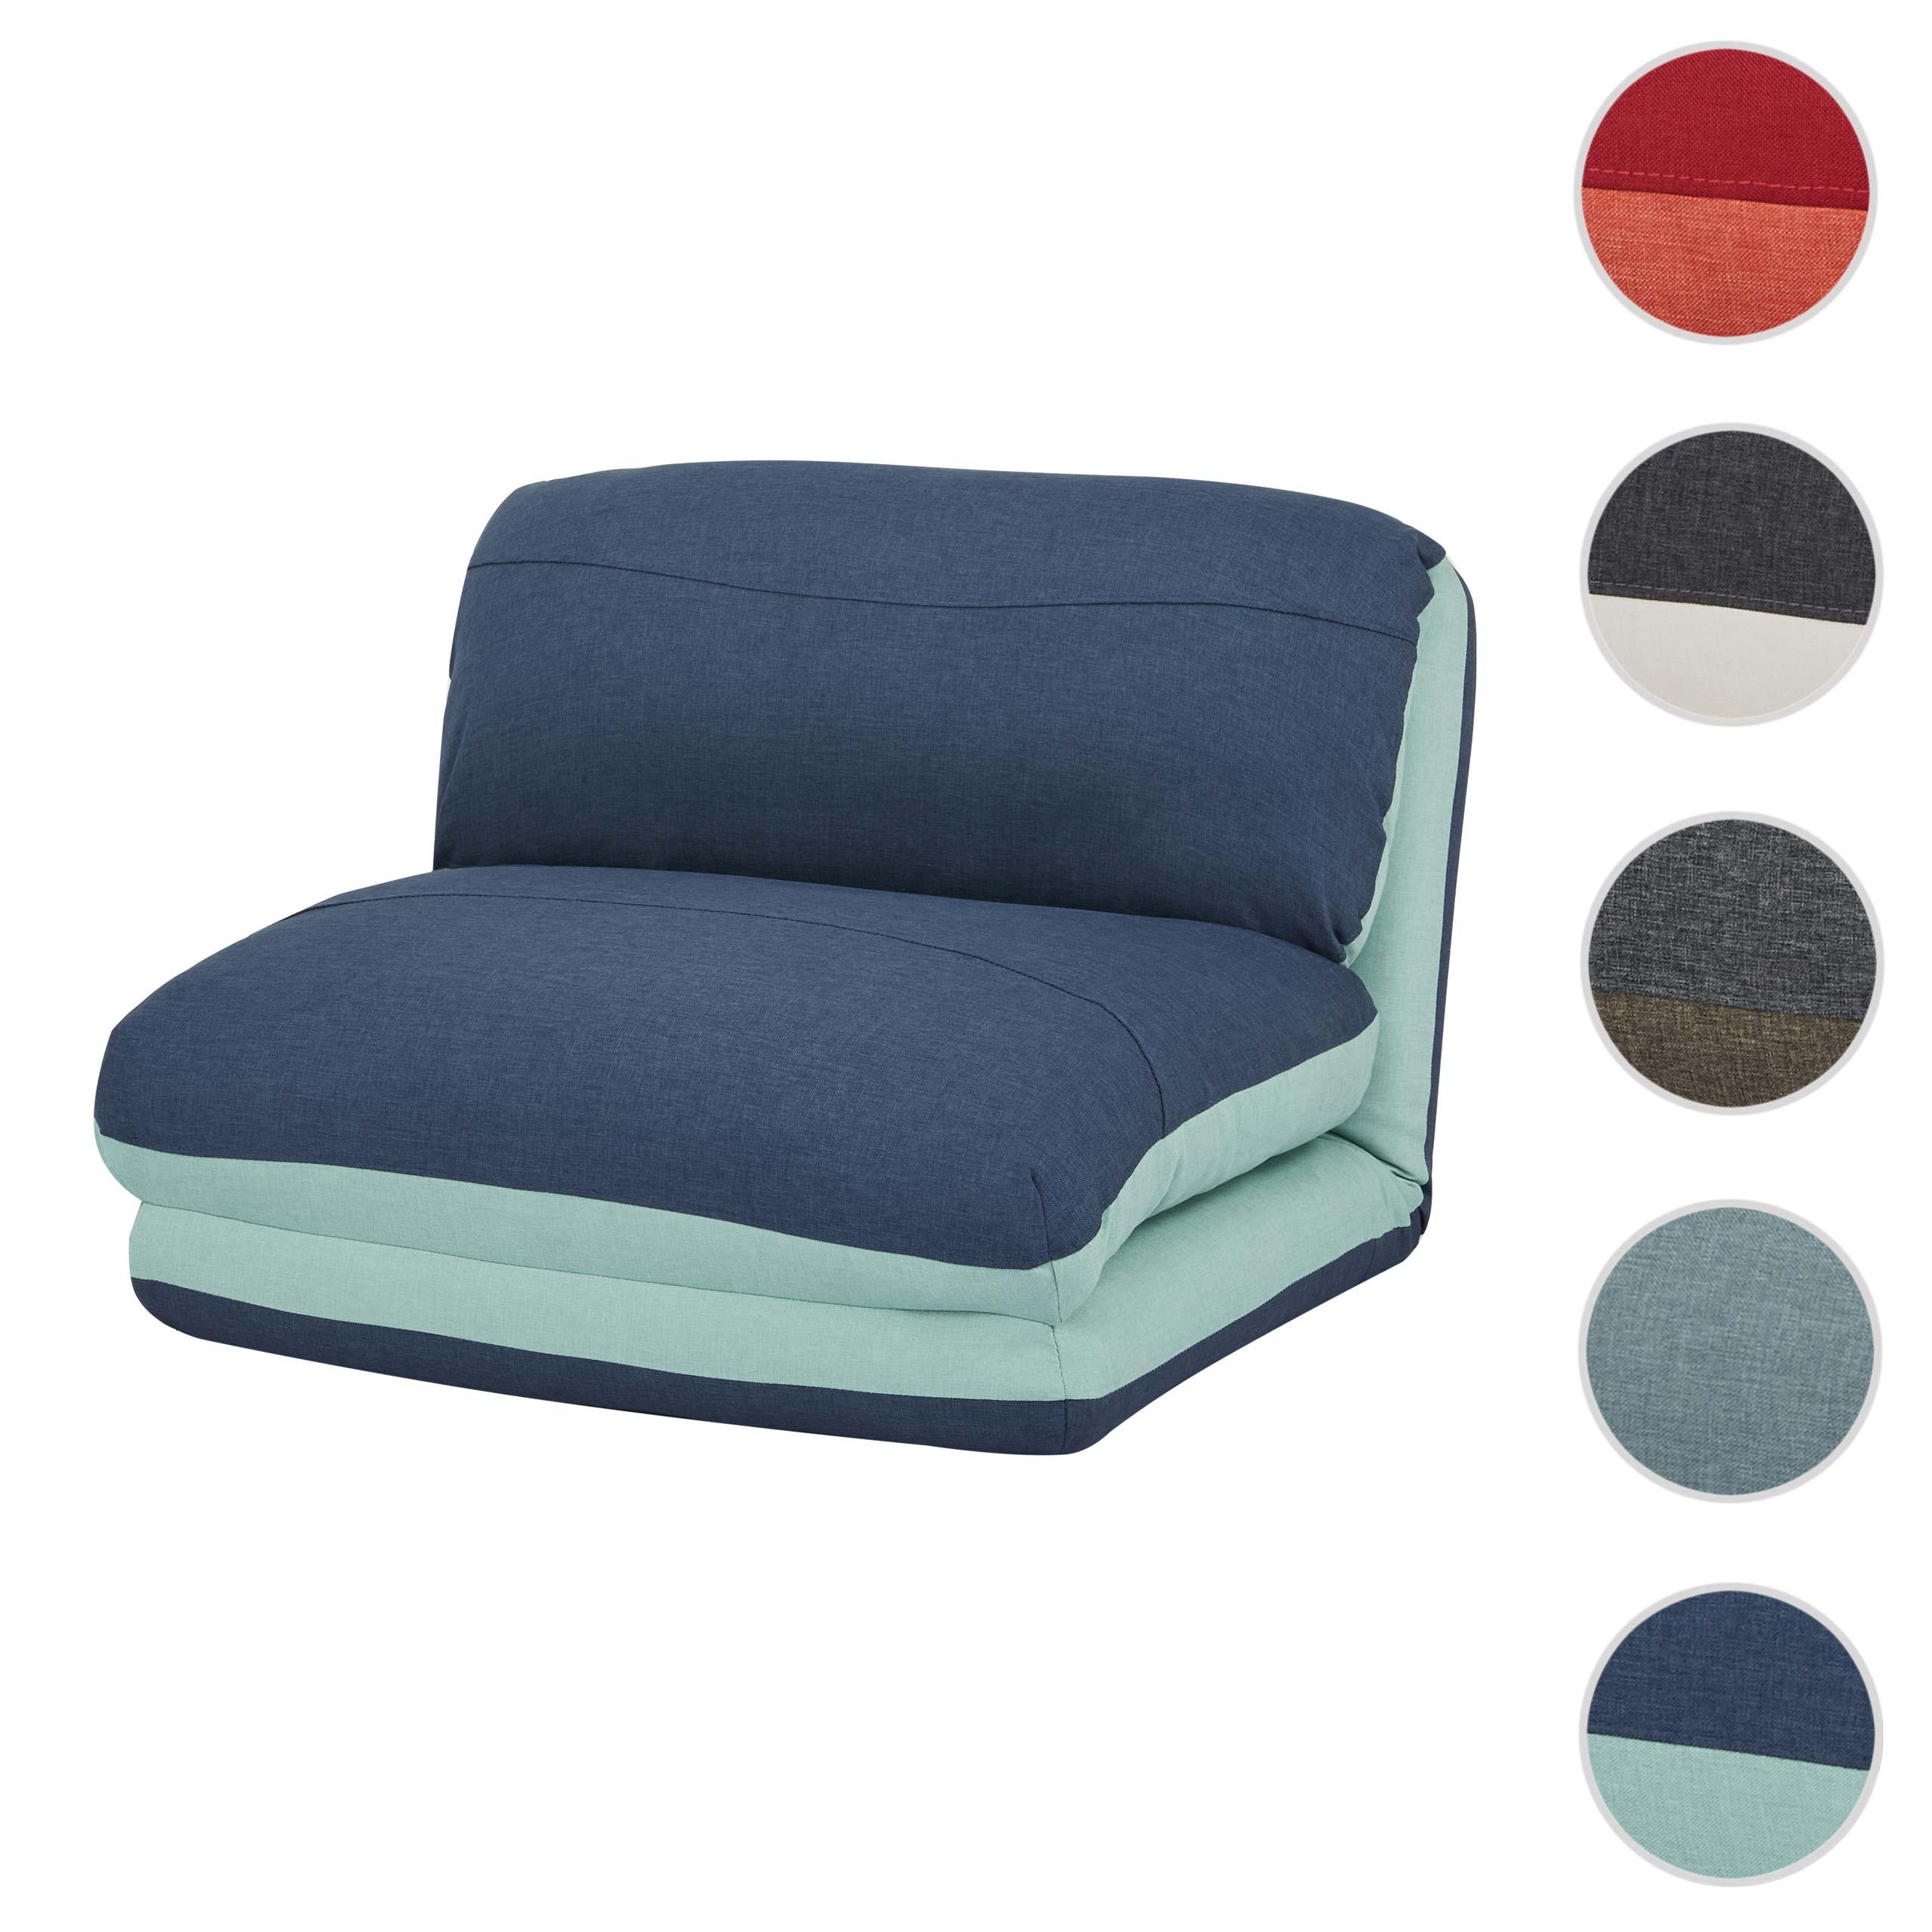 Mendler Schlafsessel HWC-E68, Schlafsofa Funktionssessel Klappsessel Relaxsessel, Stoff/Textil ~ Variantenan 68528